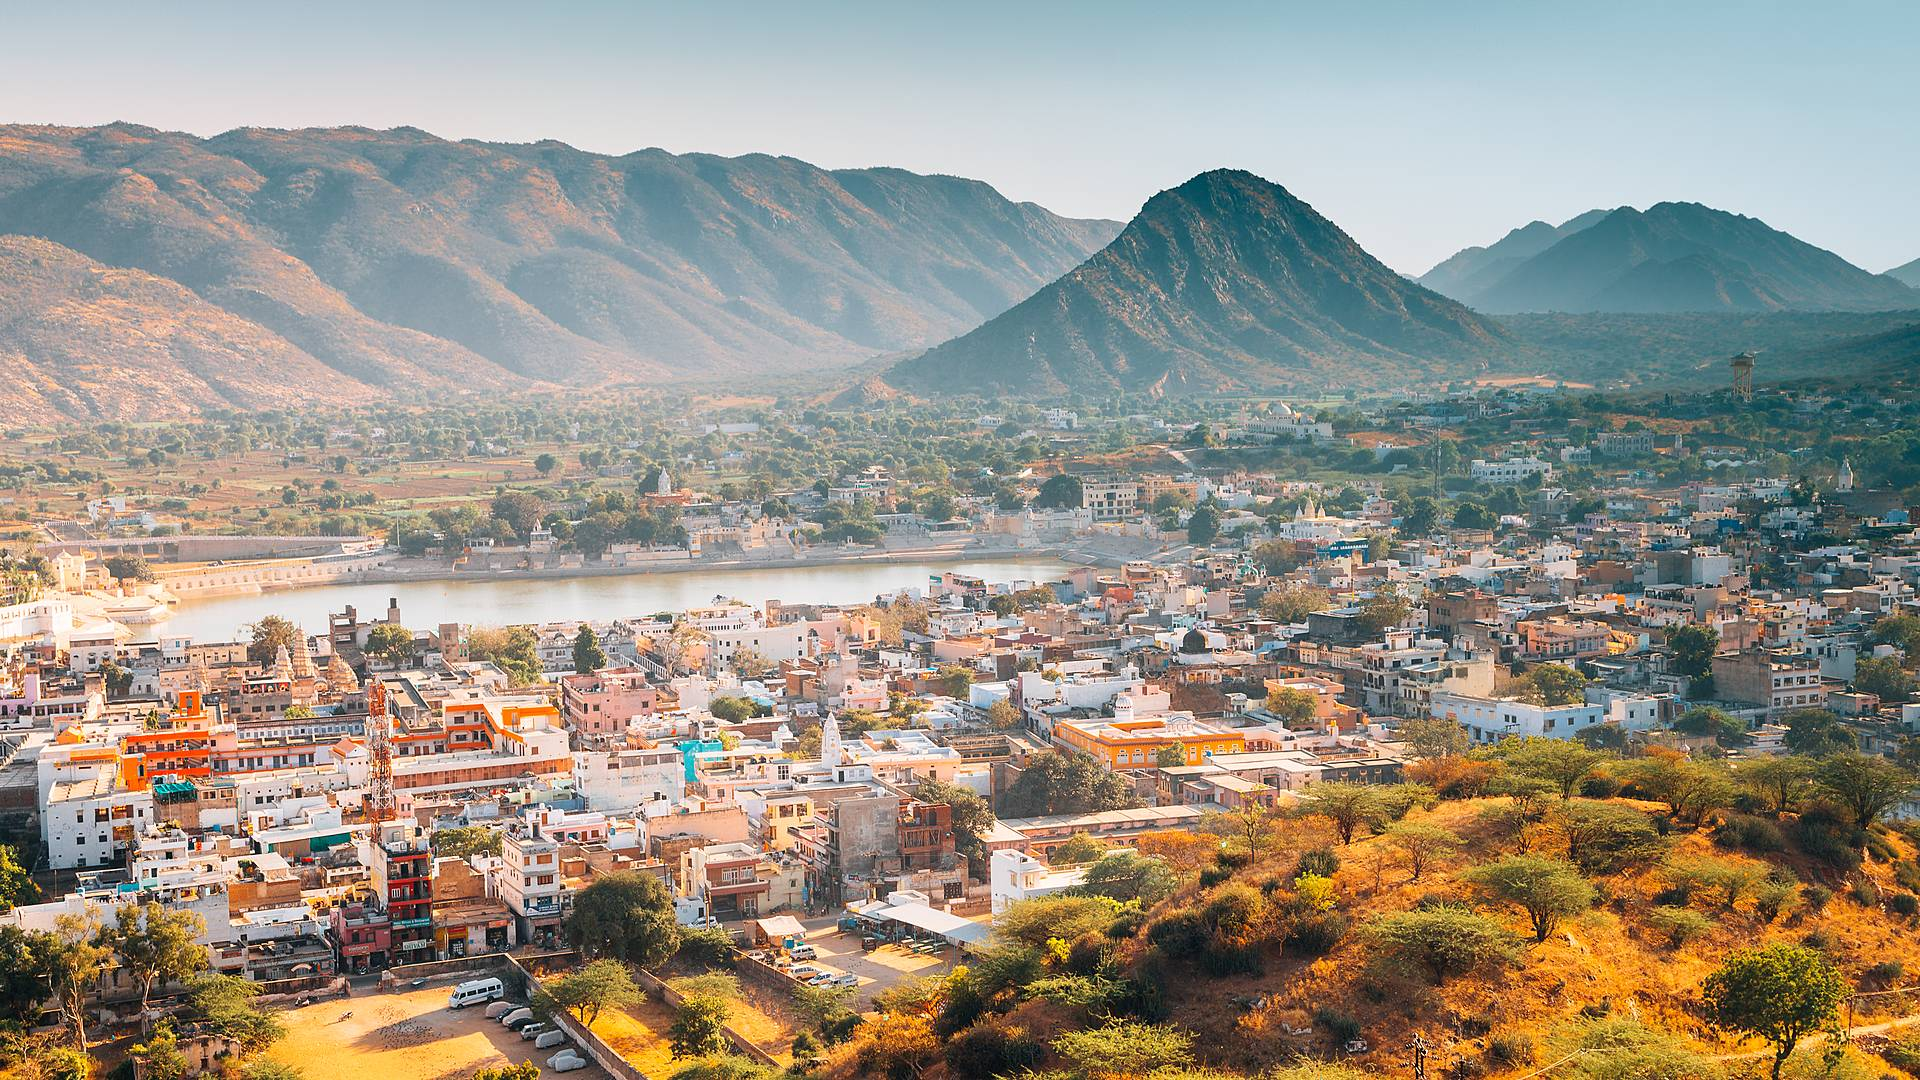 Rajasthan durante la fiera di Pushkar (Speciale Ottobre)